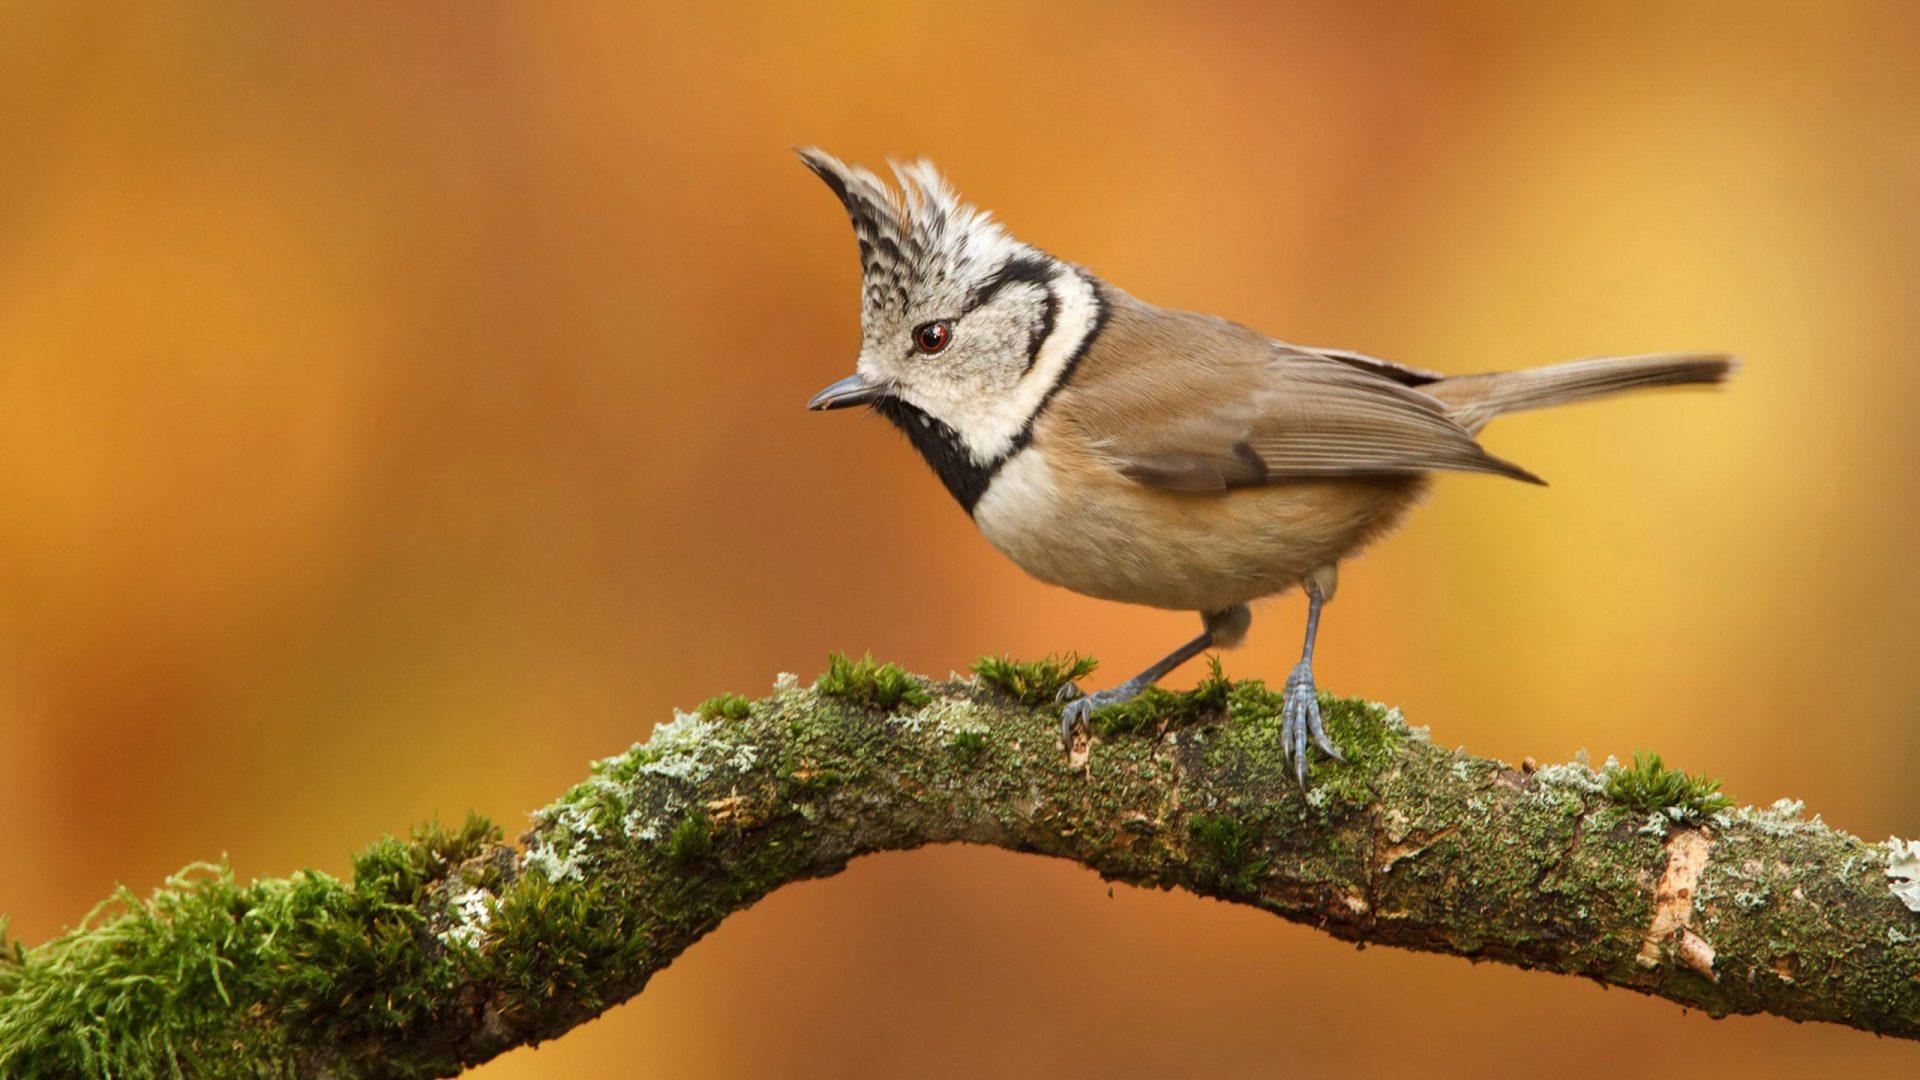 brown-bird-1920x1080-Need-iPhone-S-Plus-Background-for-IPhoneSPlus-F-wallpaper-wp3603724